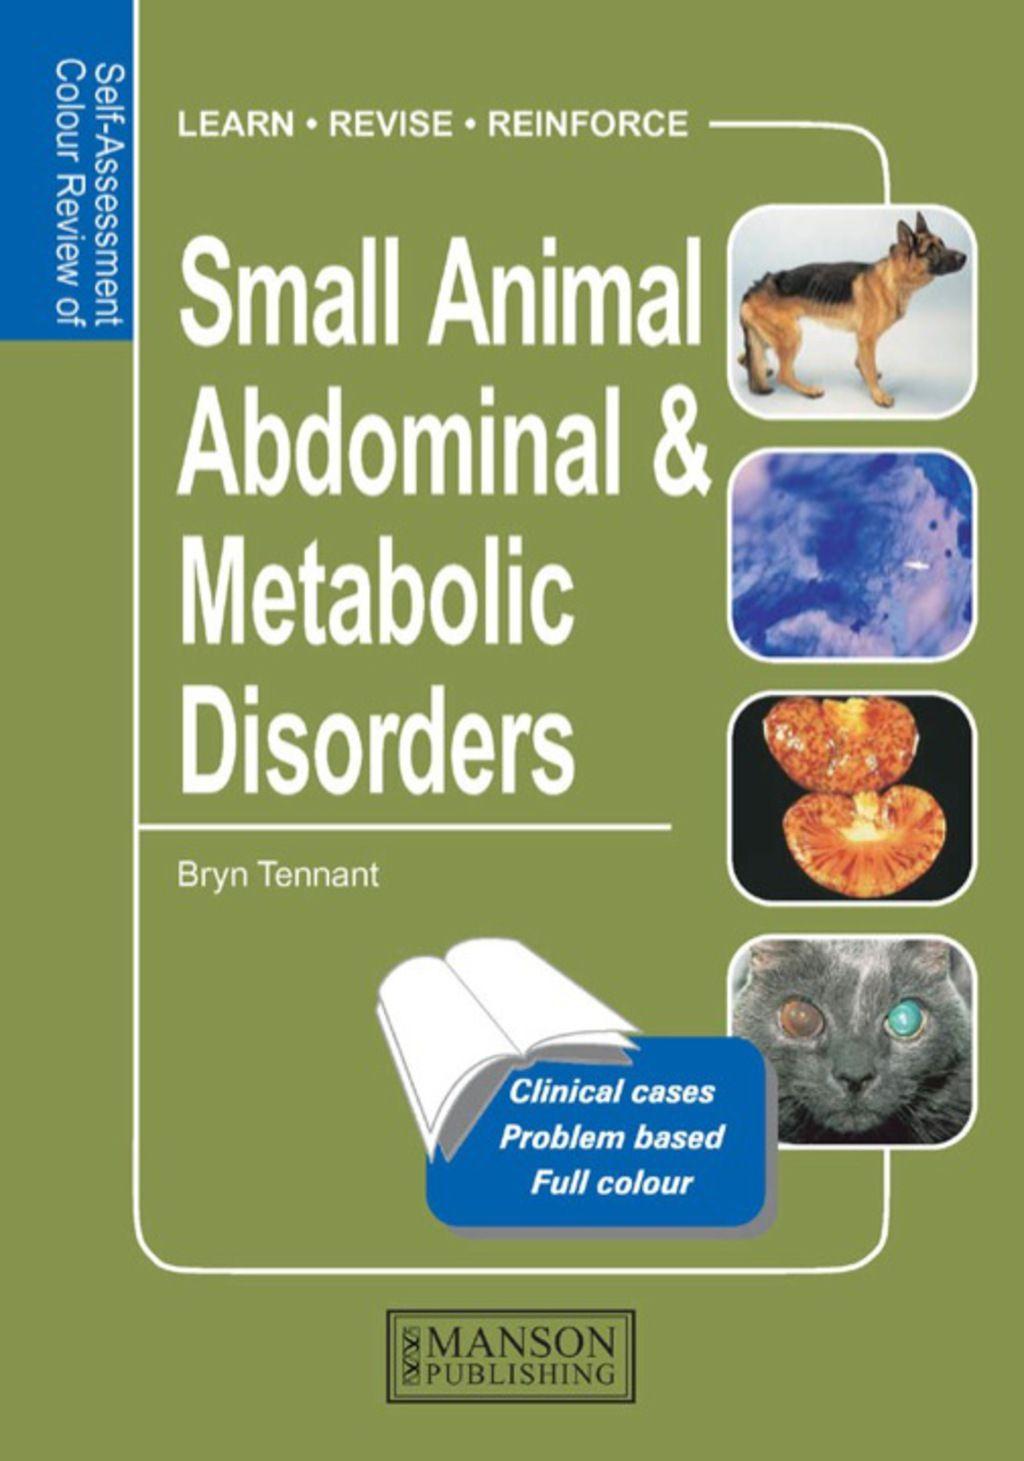 Small Animal Abdominal & Metabolic Disorders (eBook Rental